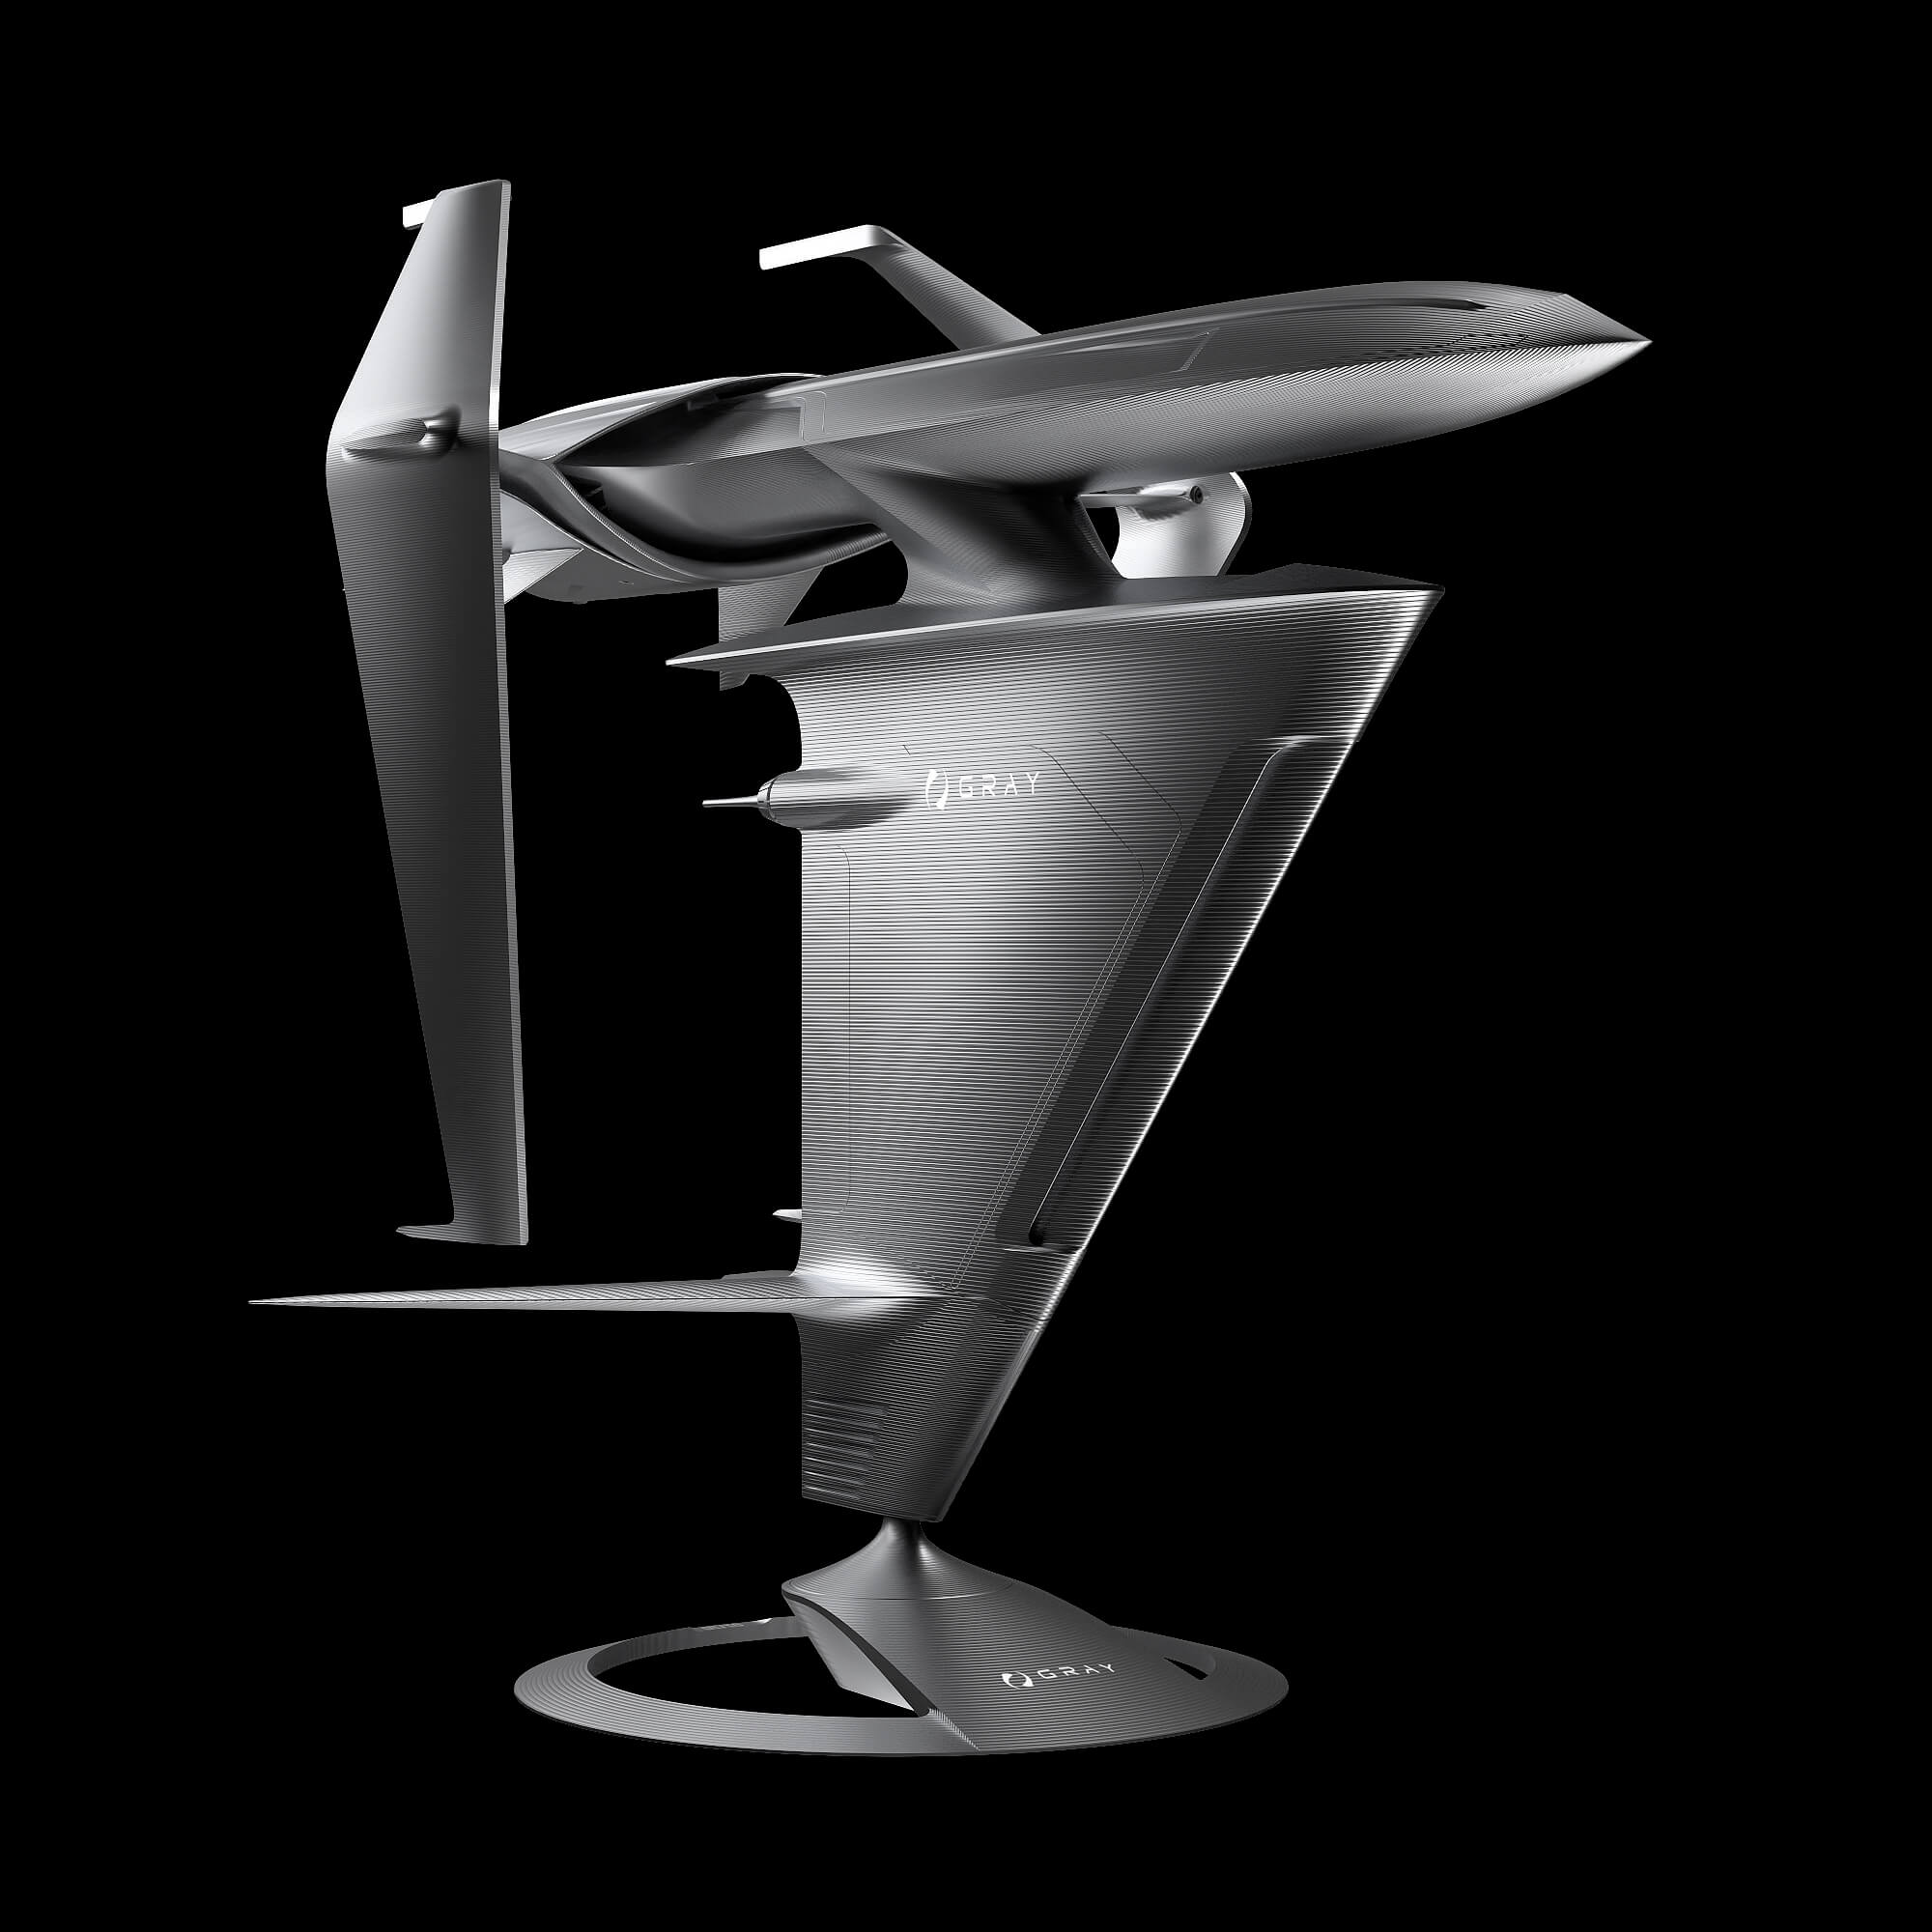 graycraft1-1 space gray aluminium spaceship art sculpture